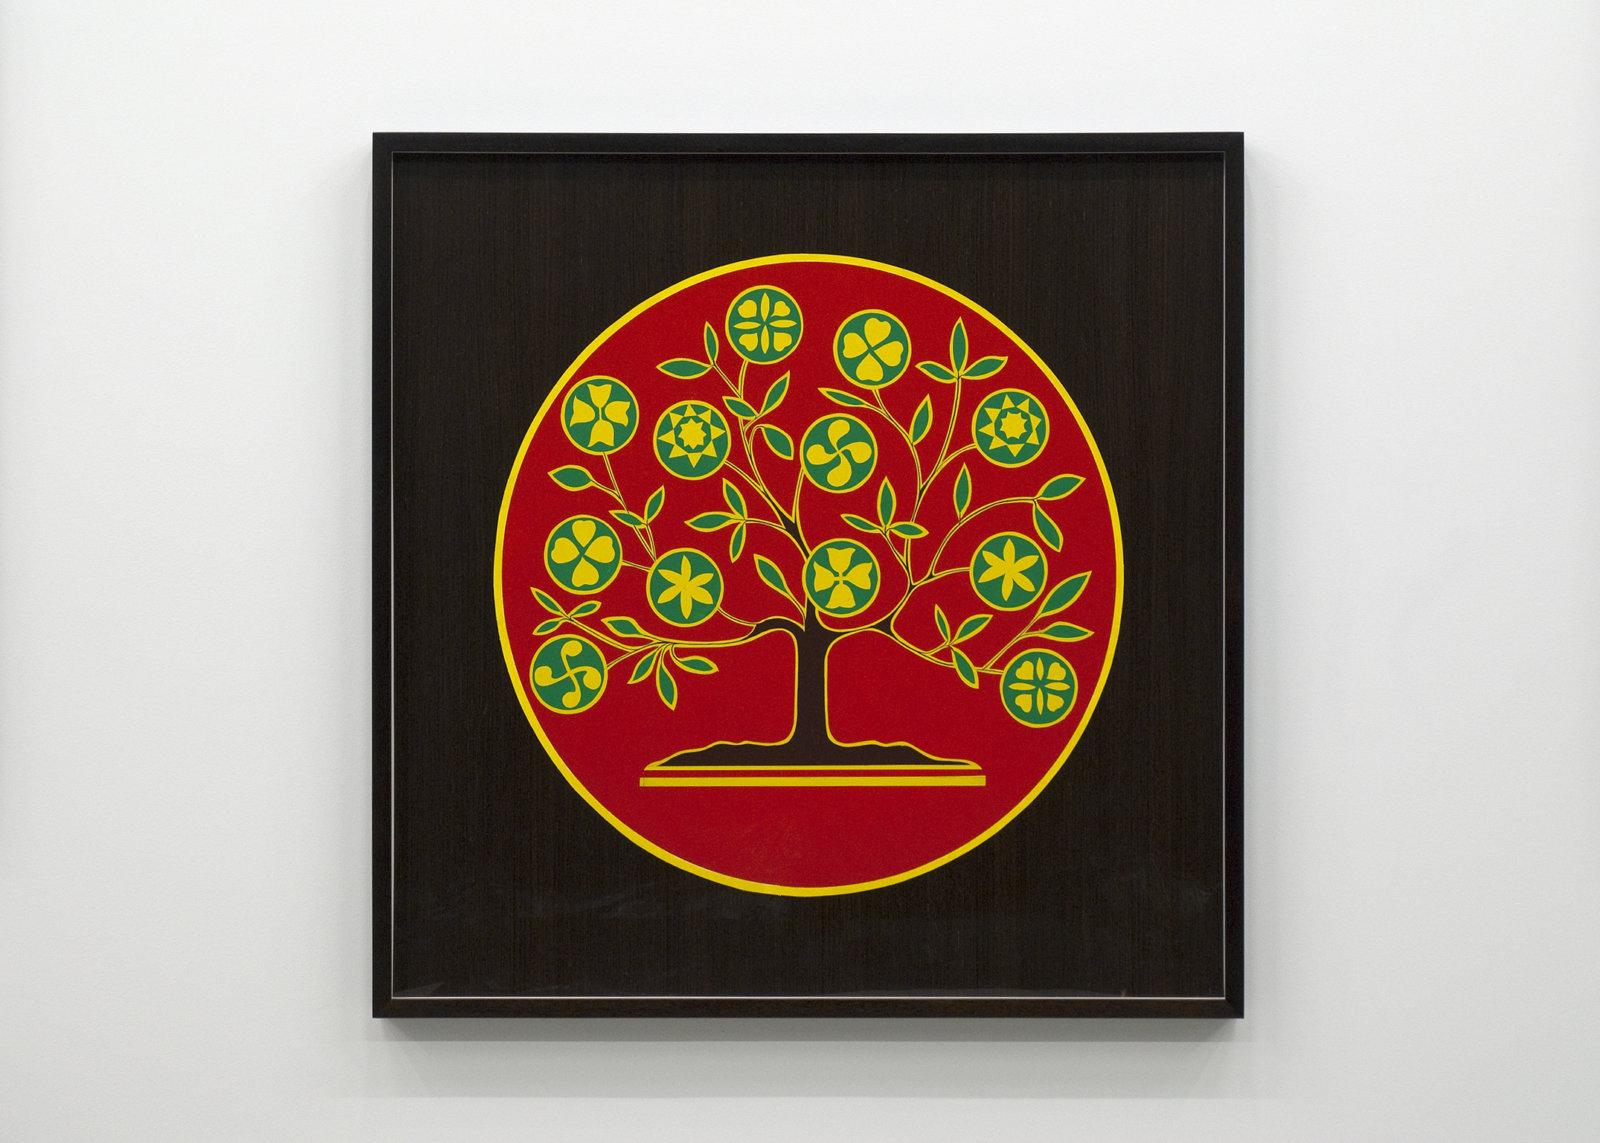 Myfanwy MacLeod, Hex V, 2009, enamel on wood, 48 x 48 in. (122 x 122 cm) by Myfanwy MacLeod